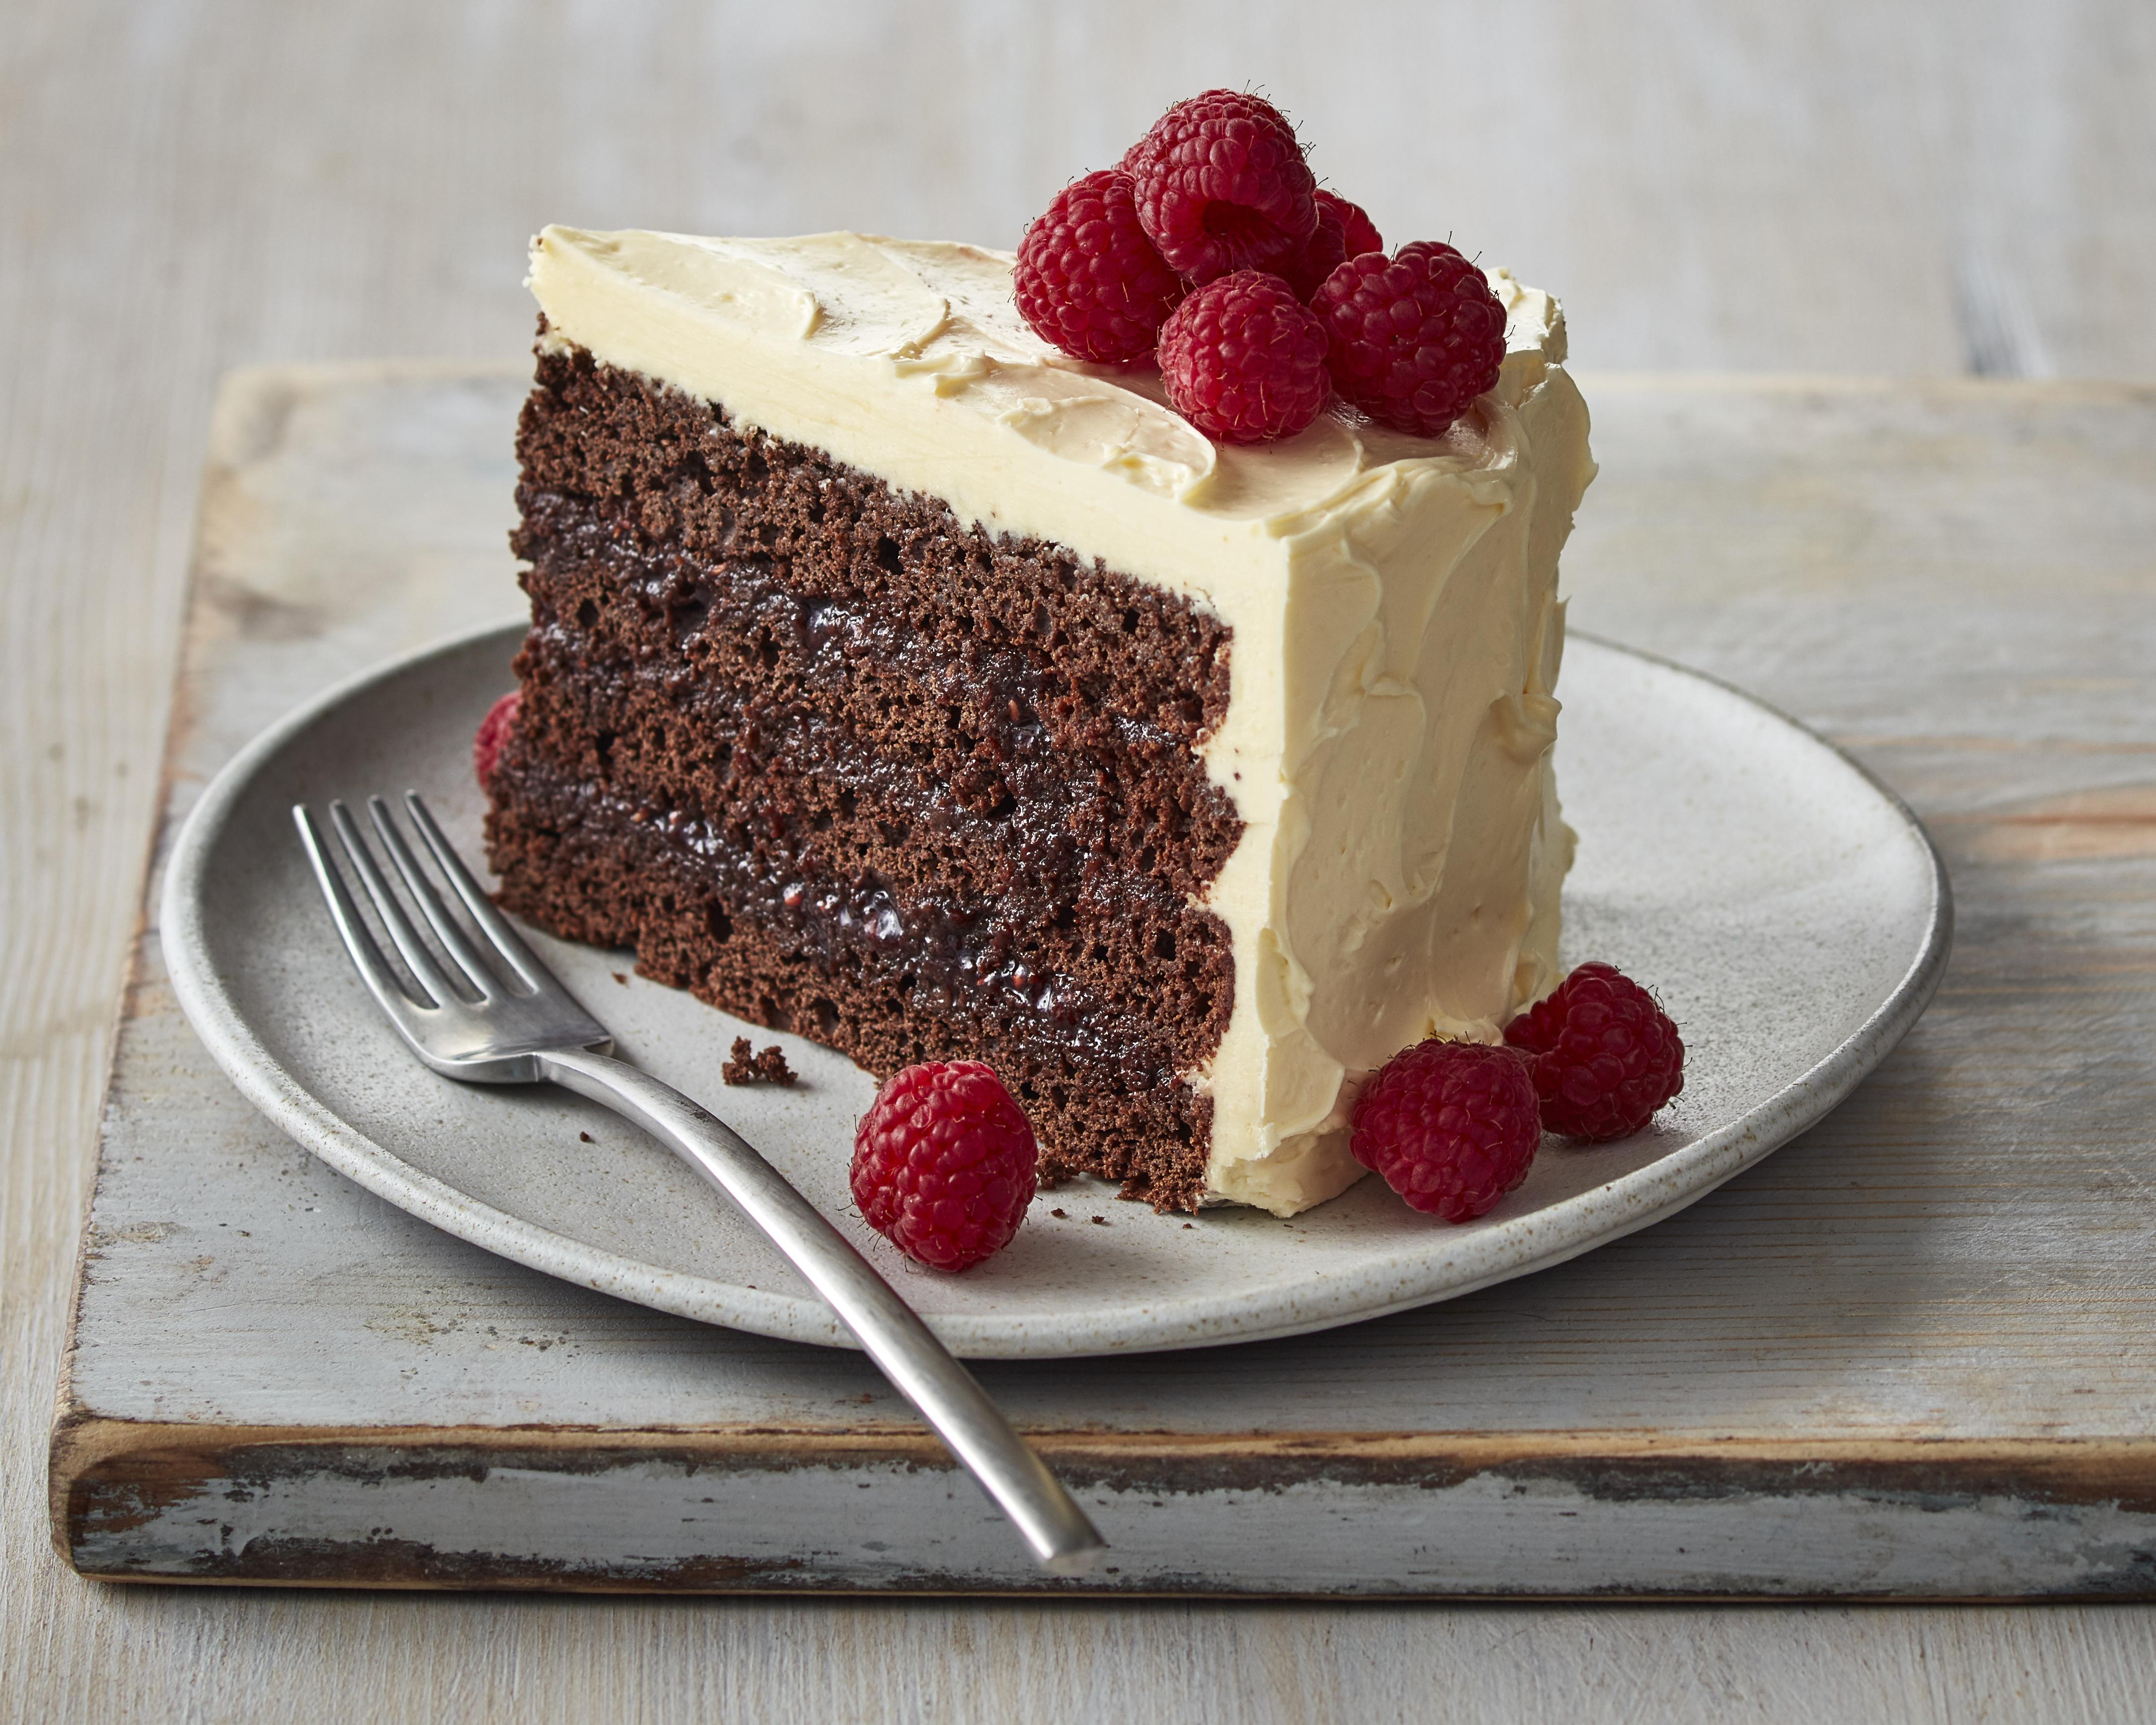 Chocolate Raspberry Cake - Icing On The Steak